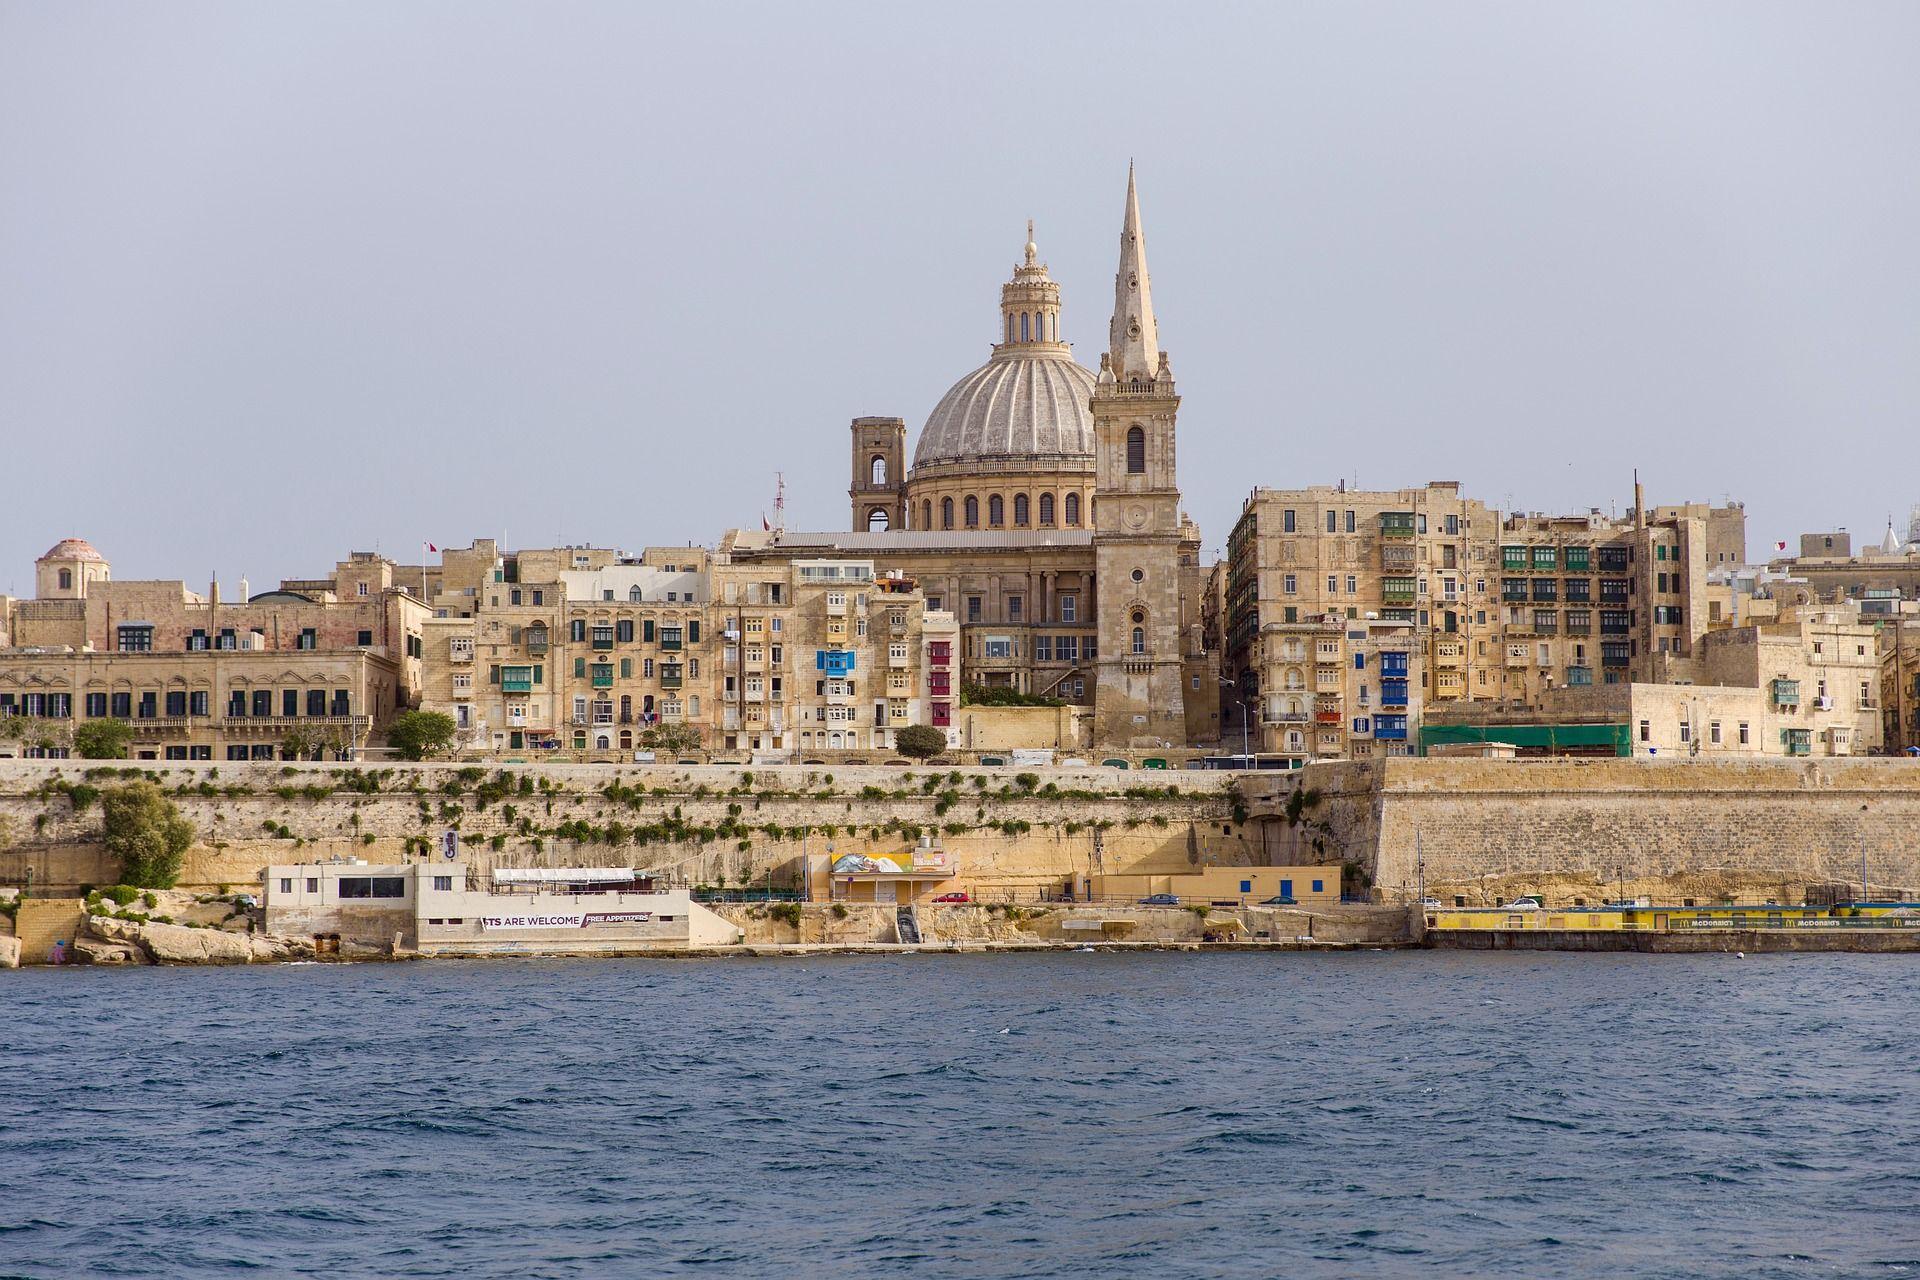 Schülersprachreise Malta St. Julians